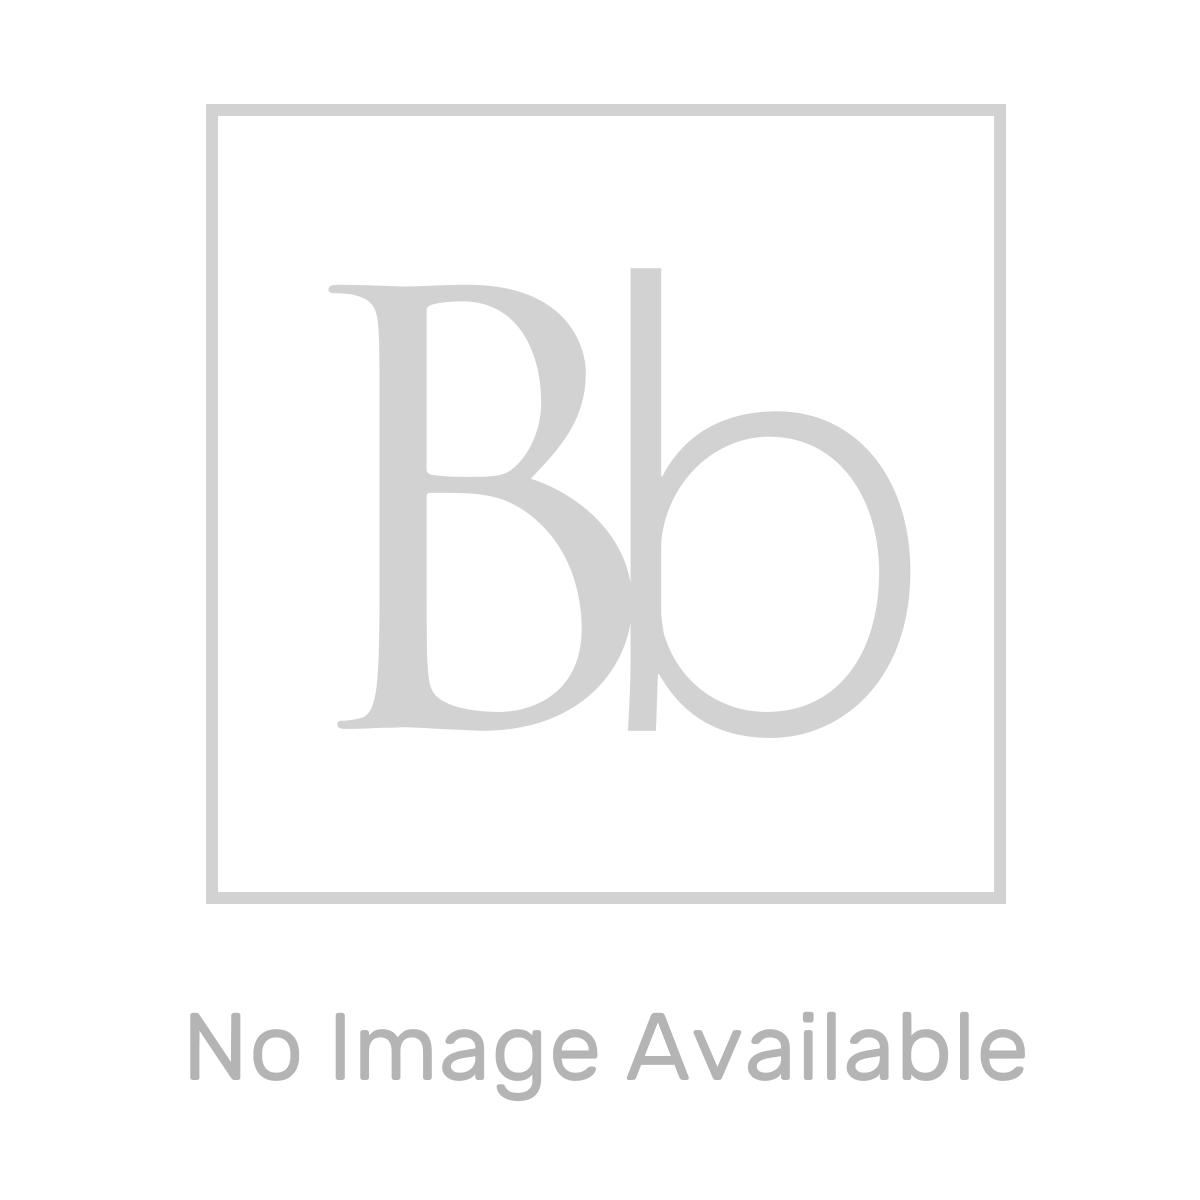 Nuie Athena Driftwood 2 Door Floor Standing Vanity Unit with 18mm Profile Basin 500mm Line Drawing